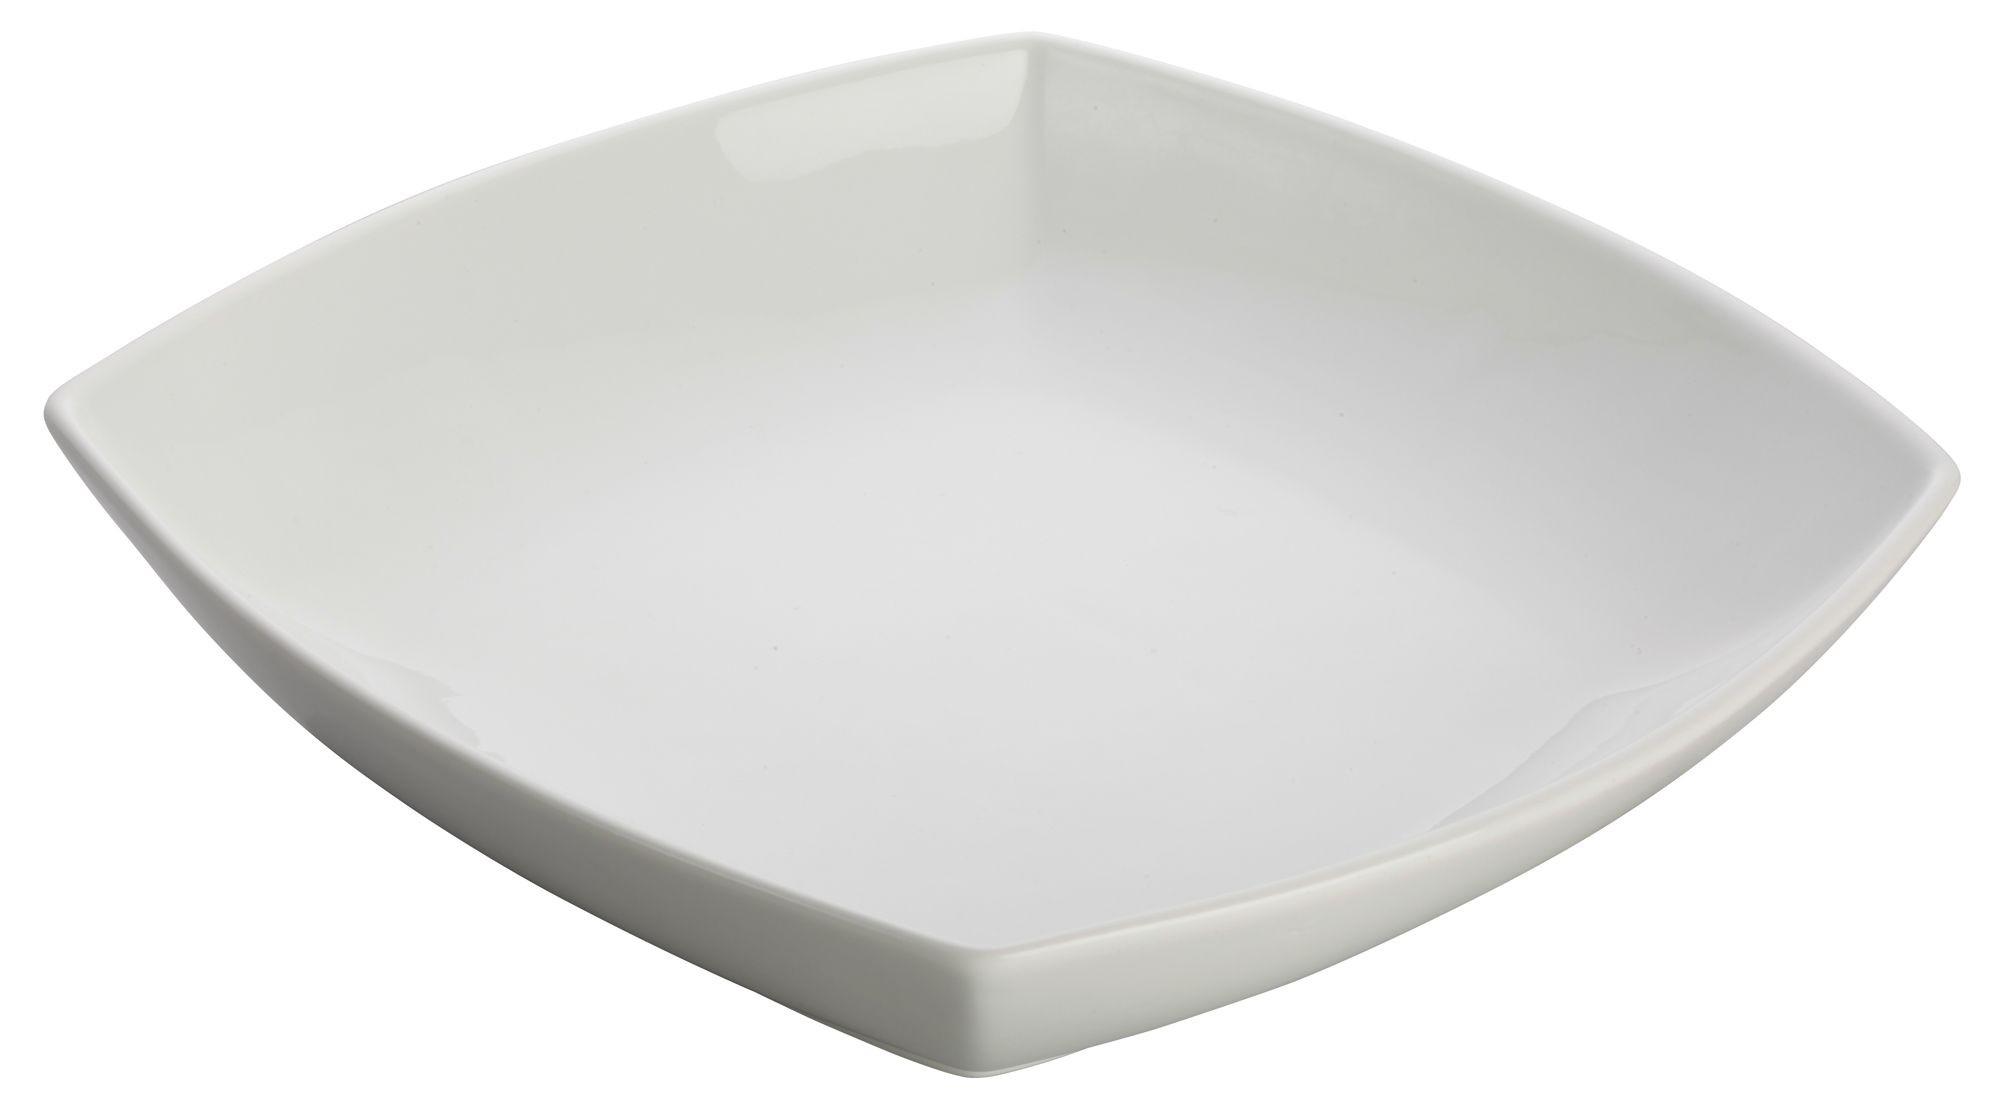 "Winco WDP019-101 Sefton Porcelain White Square Bowl 10"""